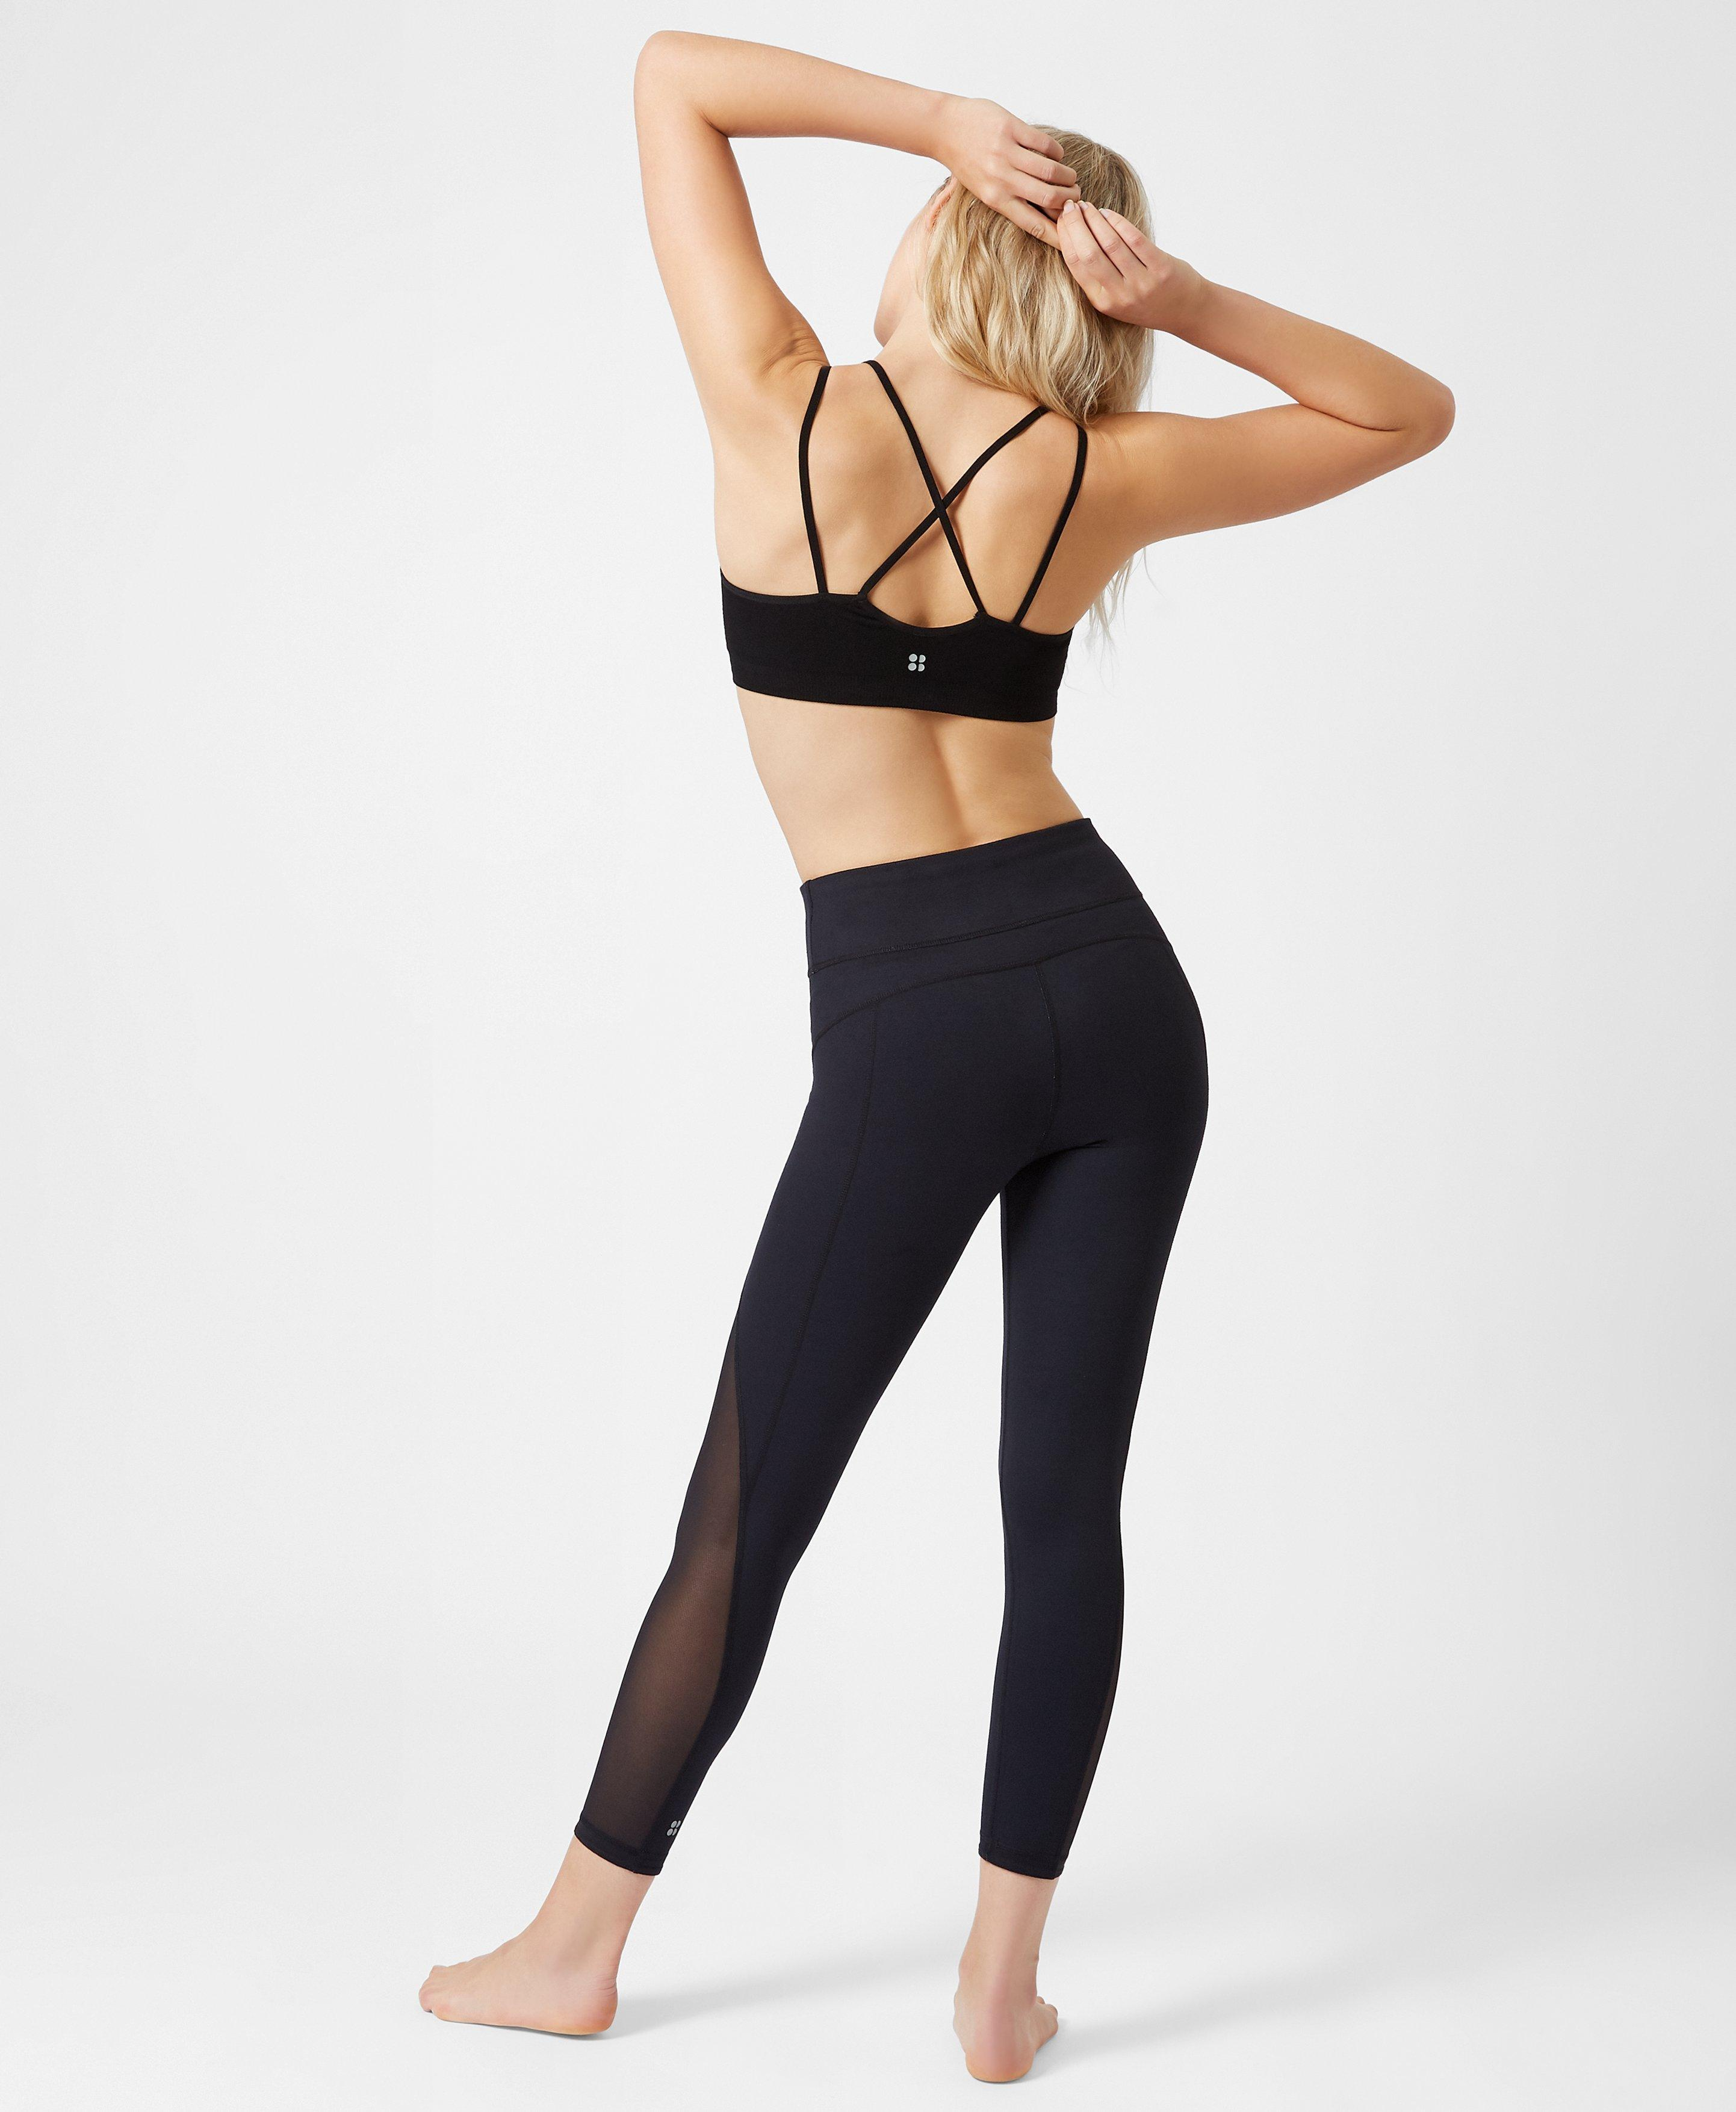 Lyst - Sweaty Betty Brahma Padded Bamboo Yoga Bra in Black a377d7f40